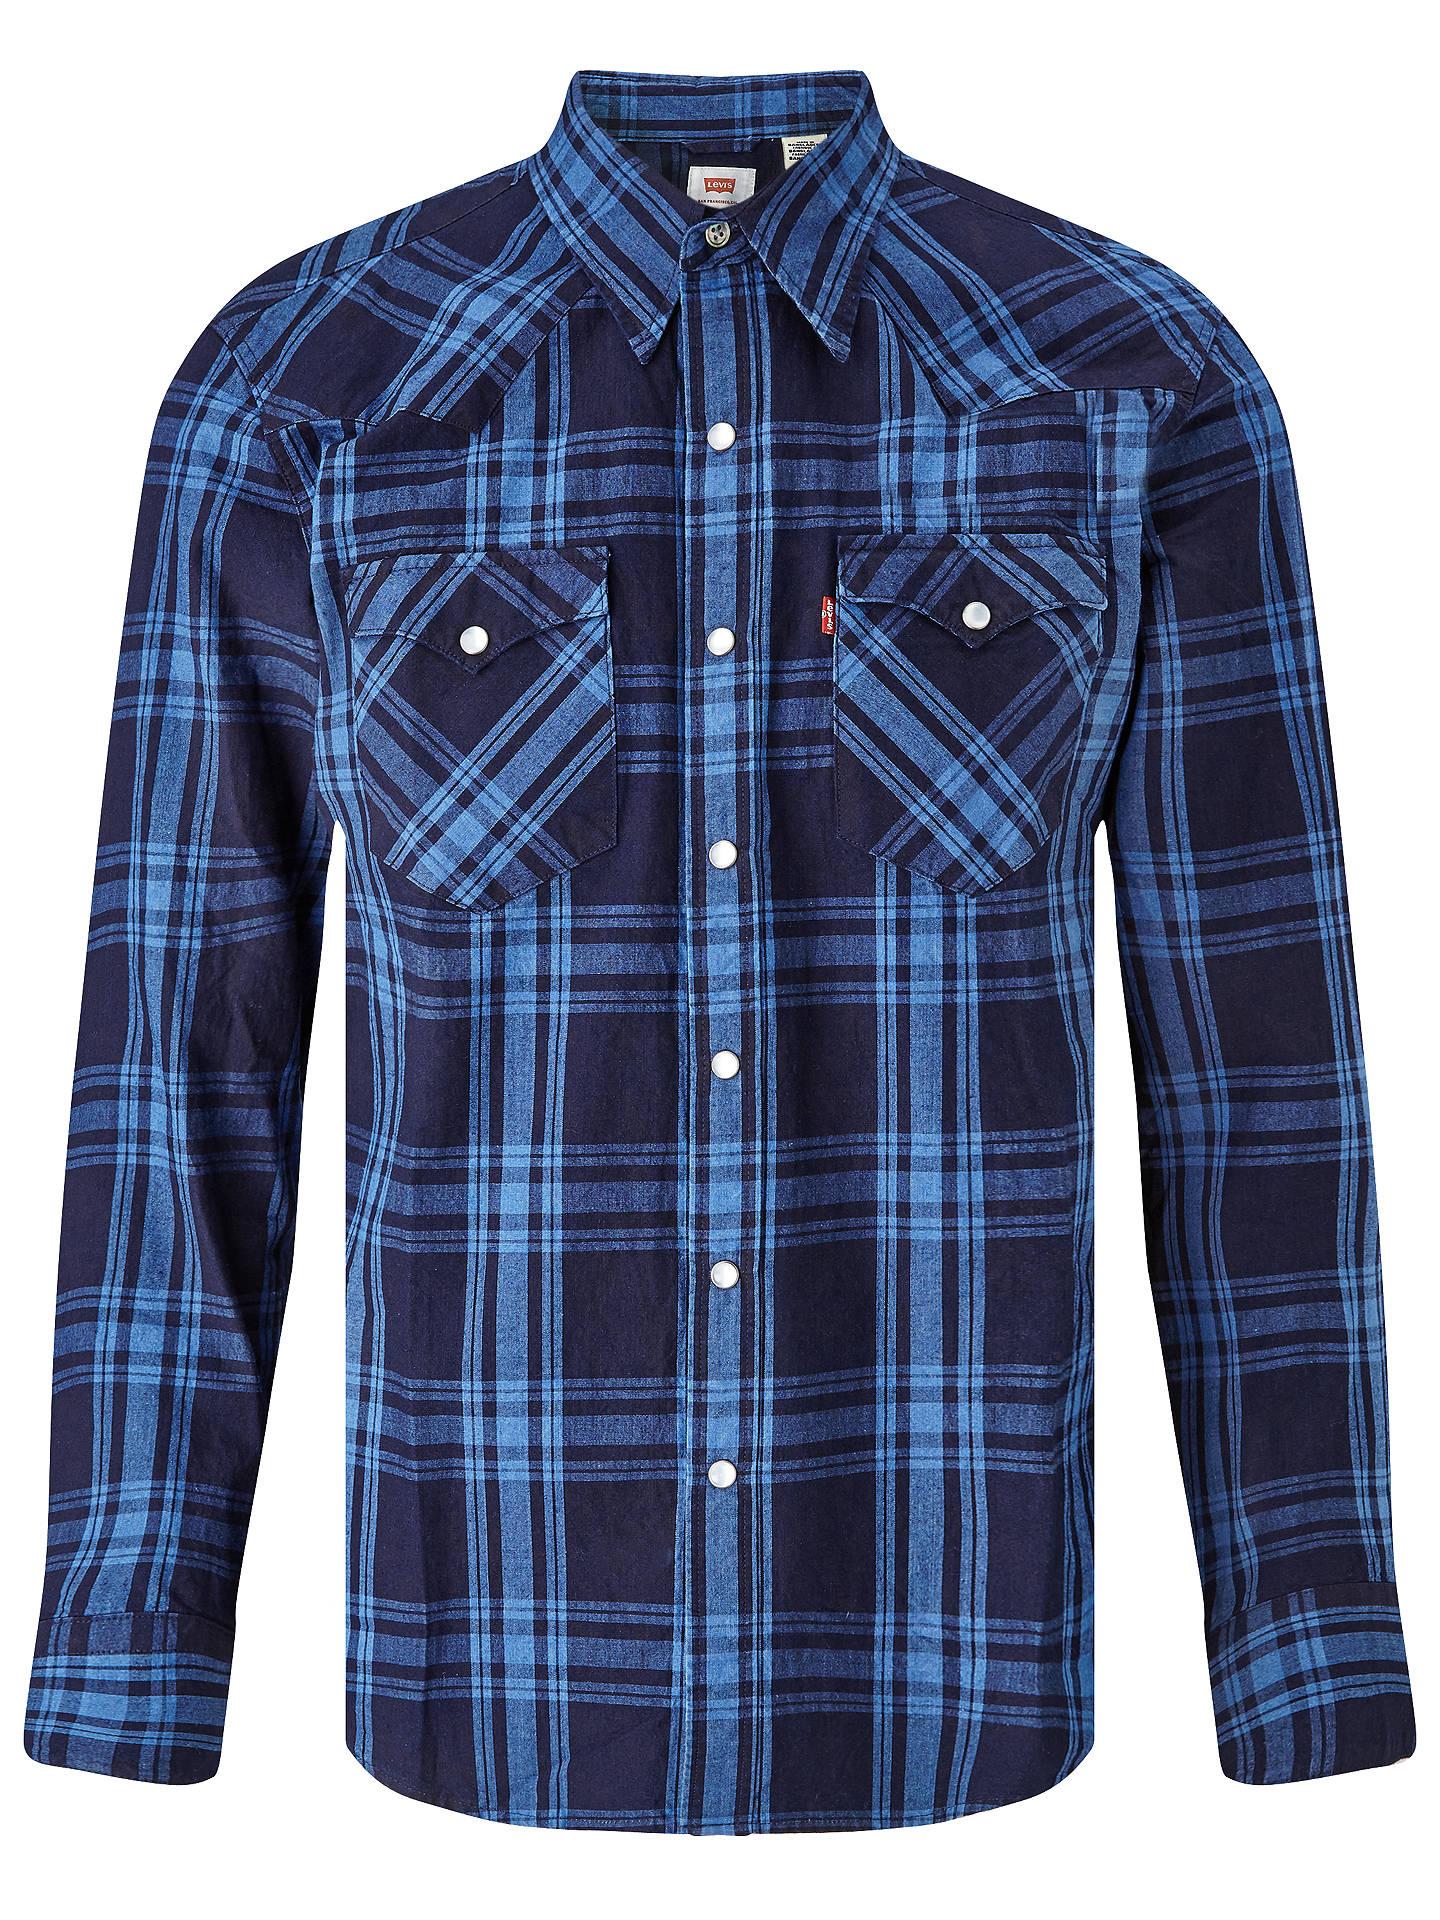 b6e9402f14 Levi s Barstow Western Shirt at John Lewis   Partners